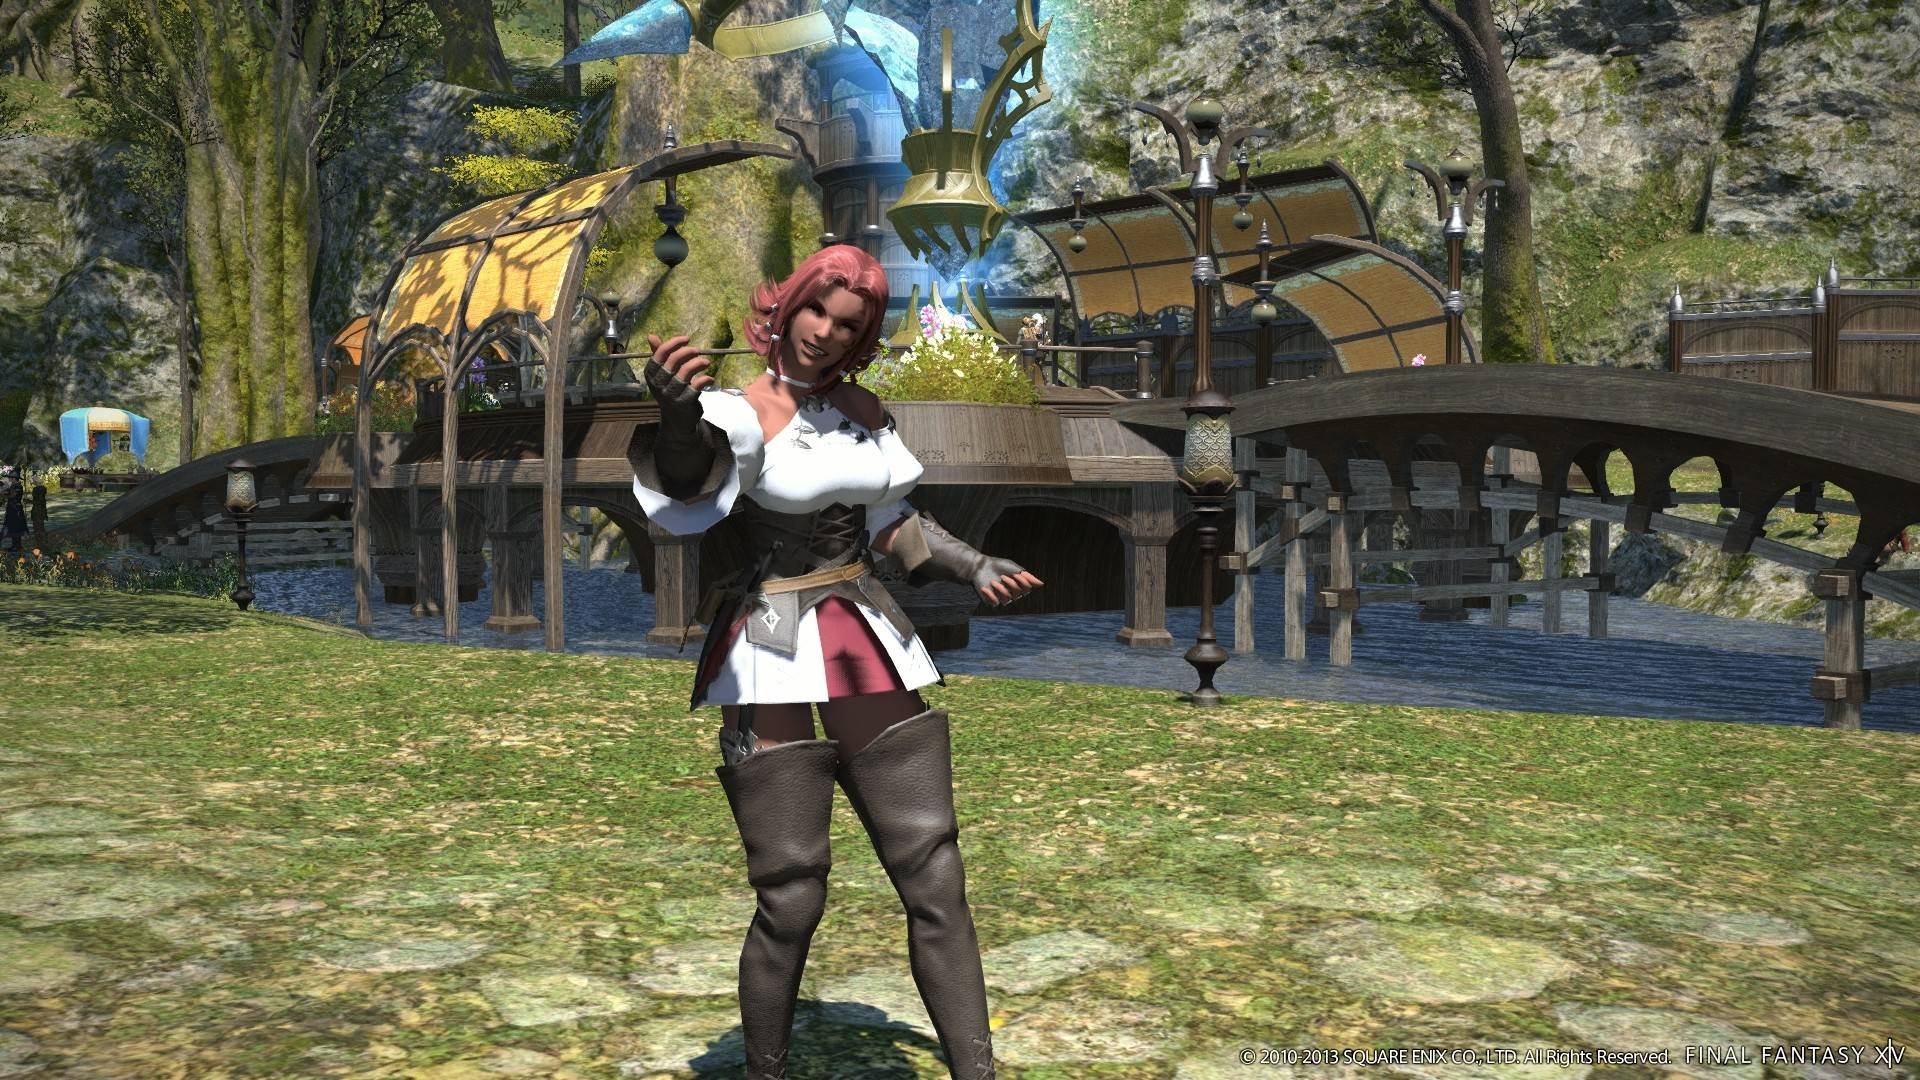 final fantasy xiv - Final Fantasy XIV A Real Reborn, l'offerta di Steam